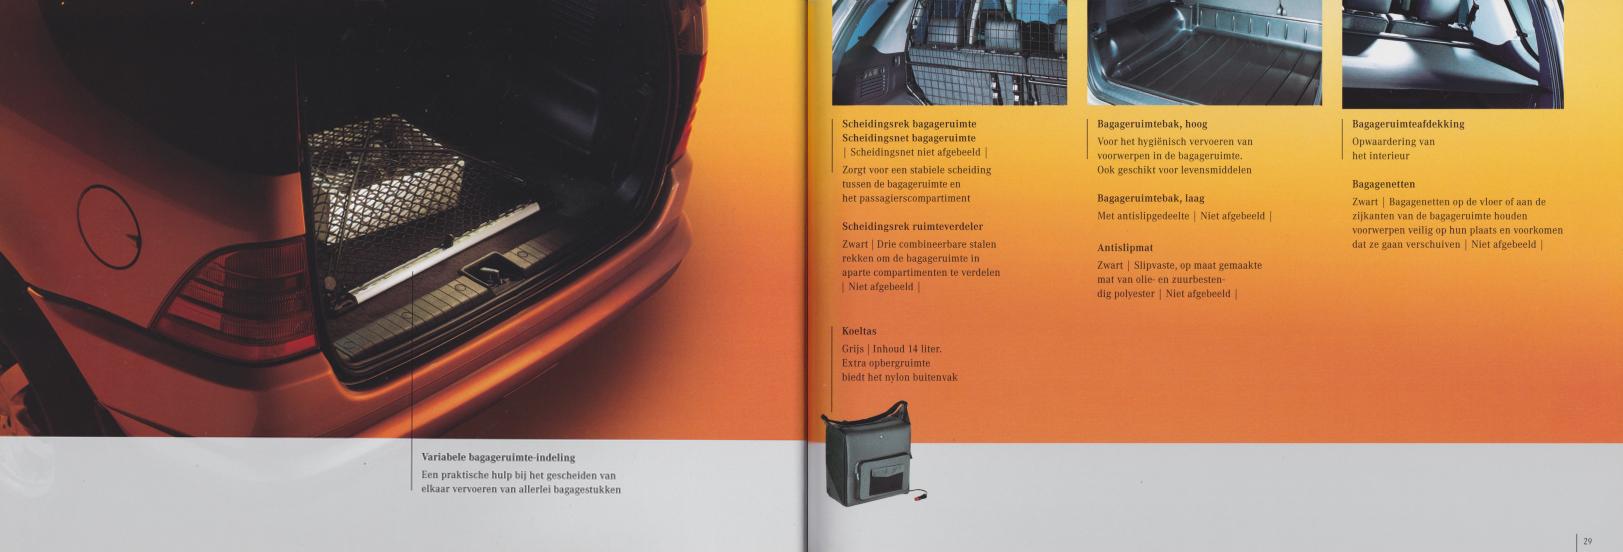 (W163): Catálogo 2001 - acessórios - neerlandês 015